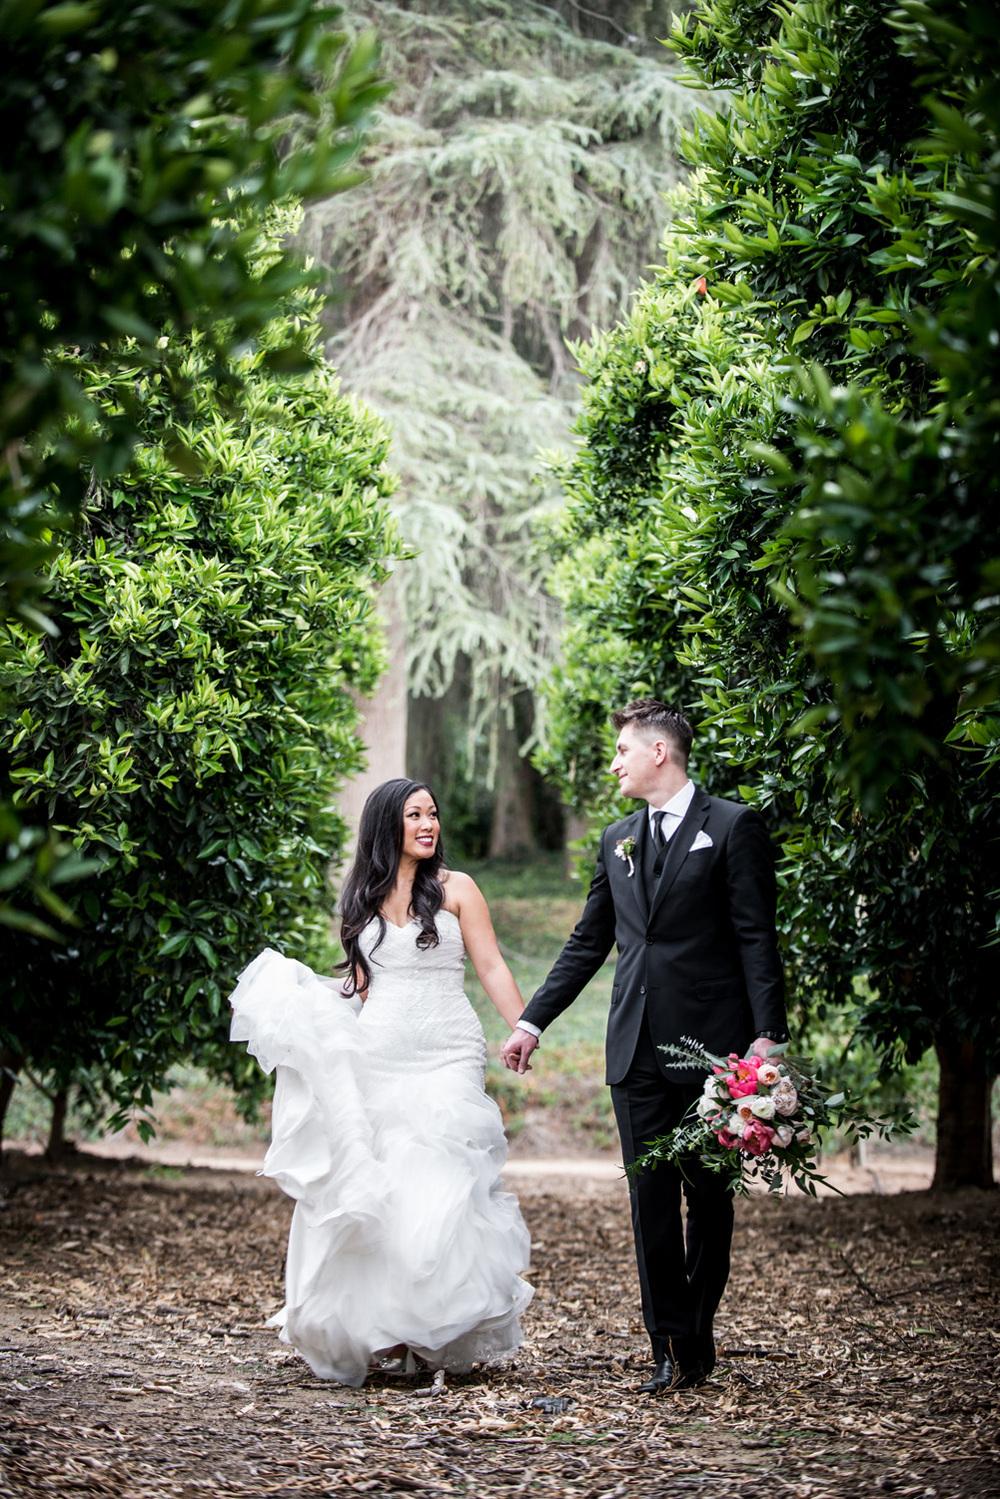 redlands_prospectpark_realcouple_orangegroves_weddingdress